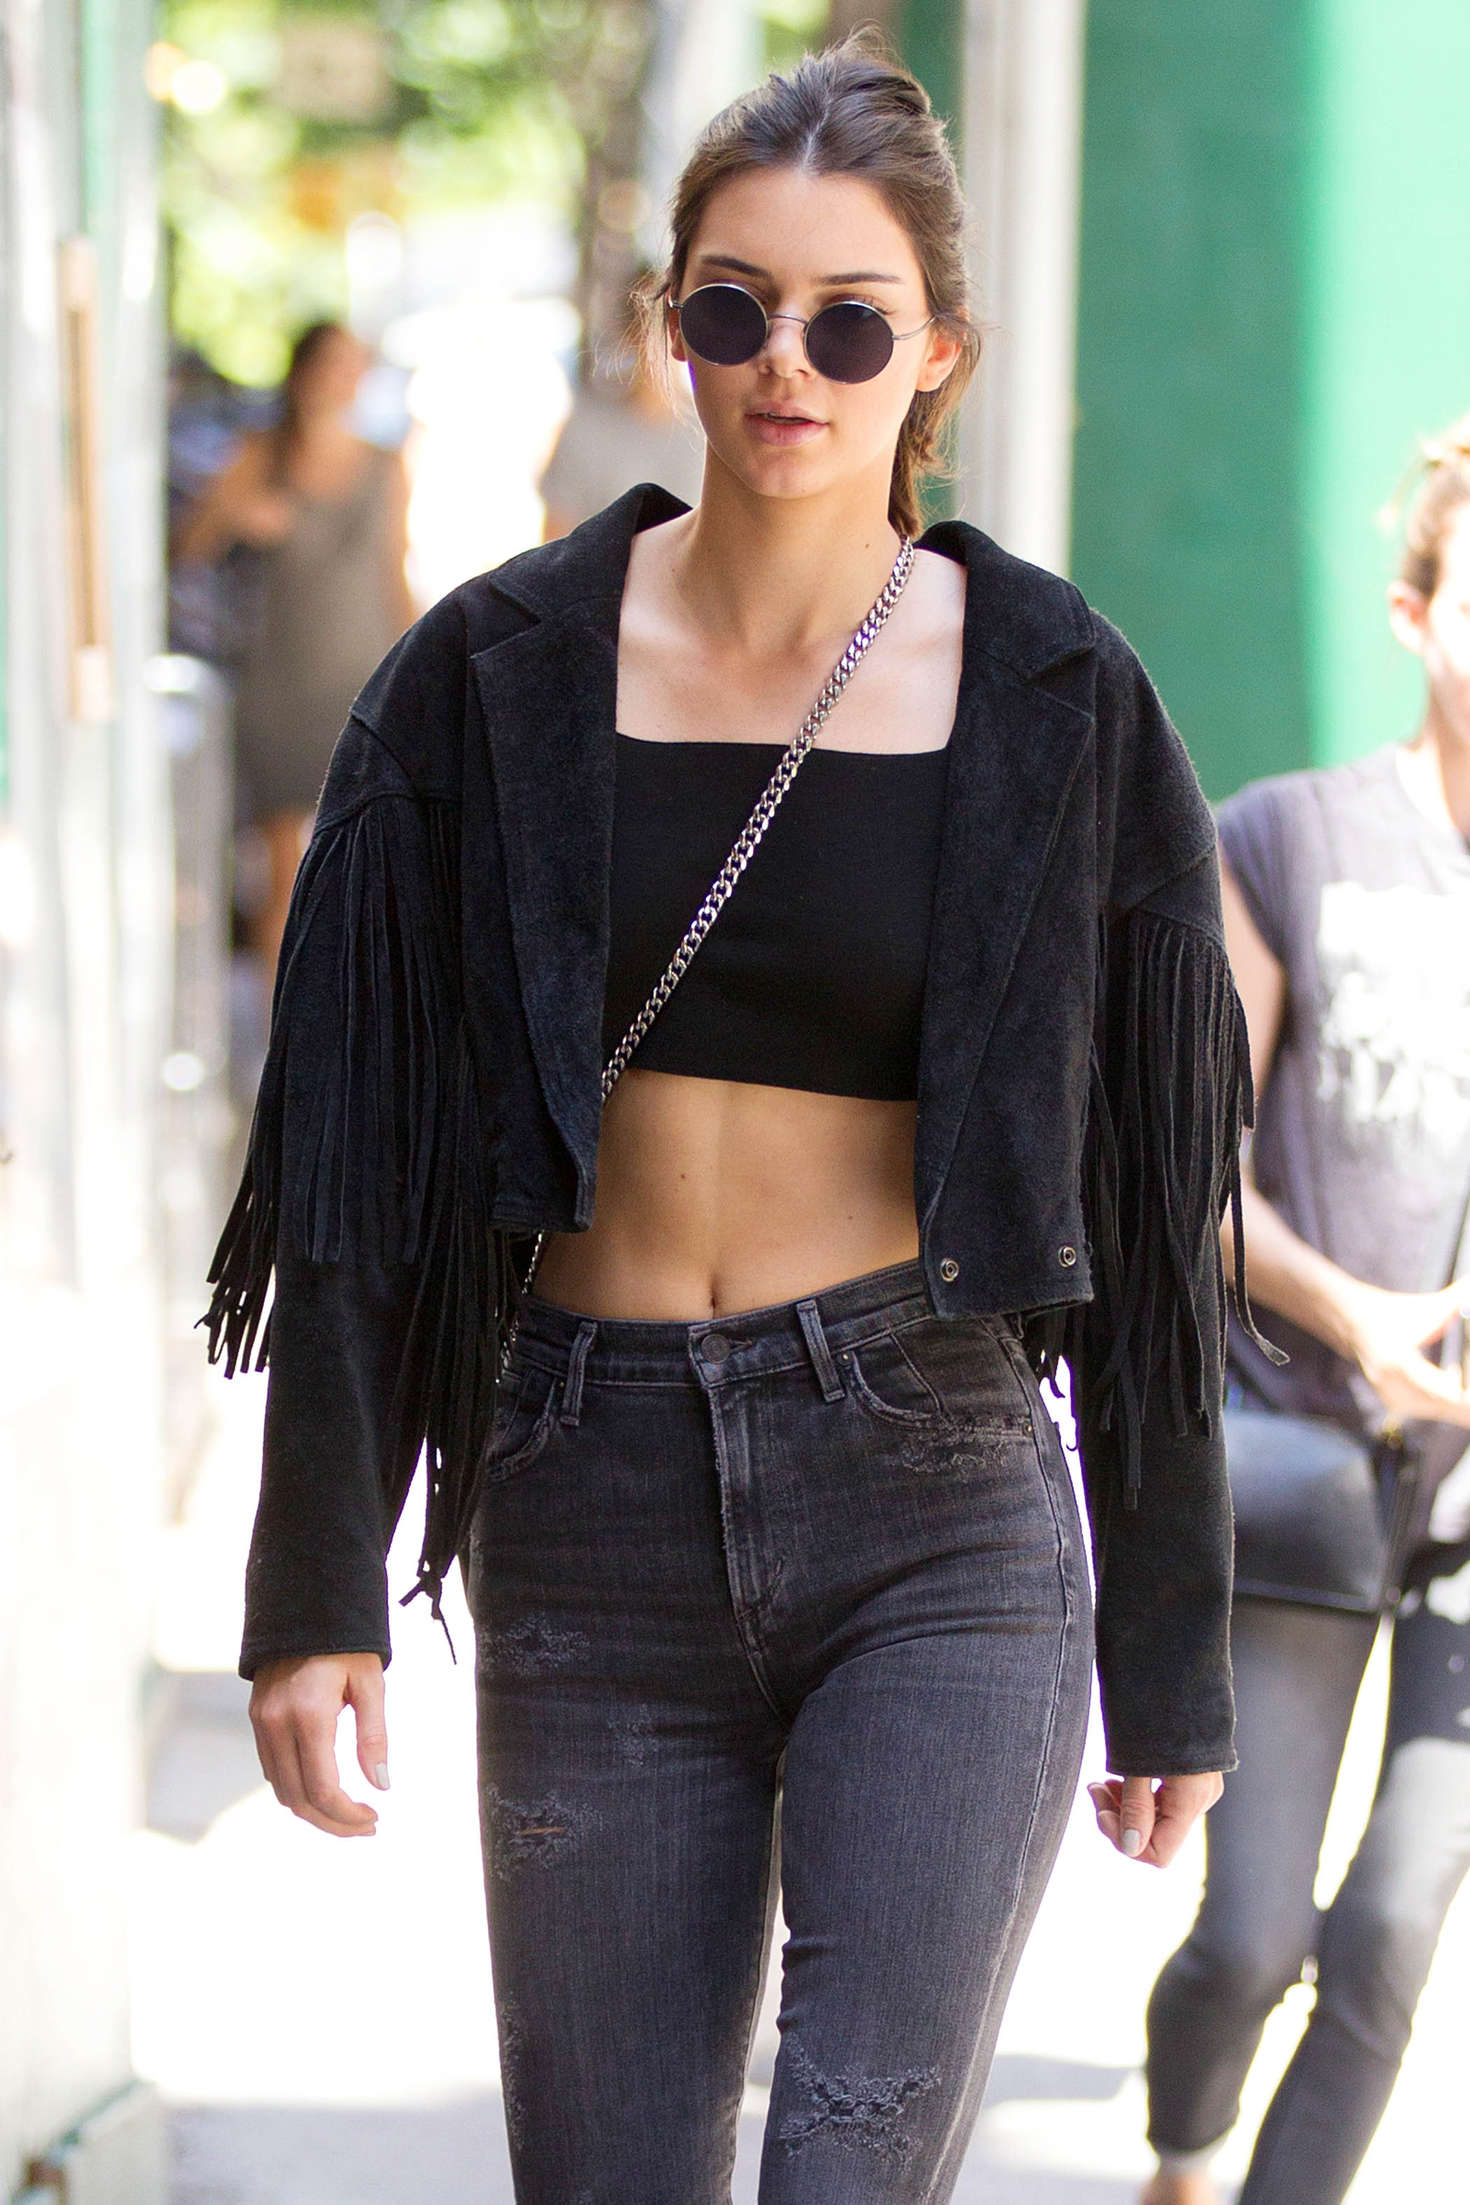 Kendall Jenner In Black Jeans 31 GotCeleb